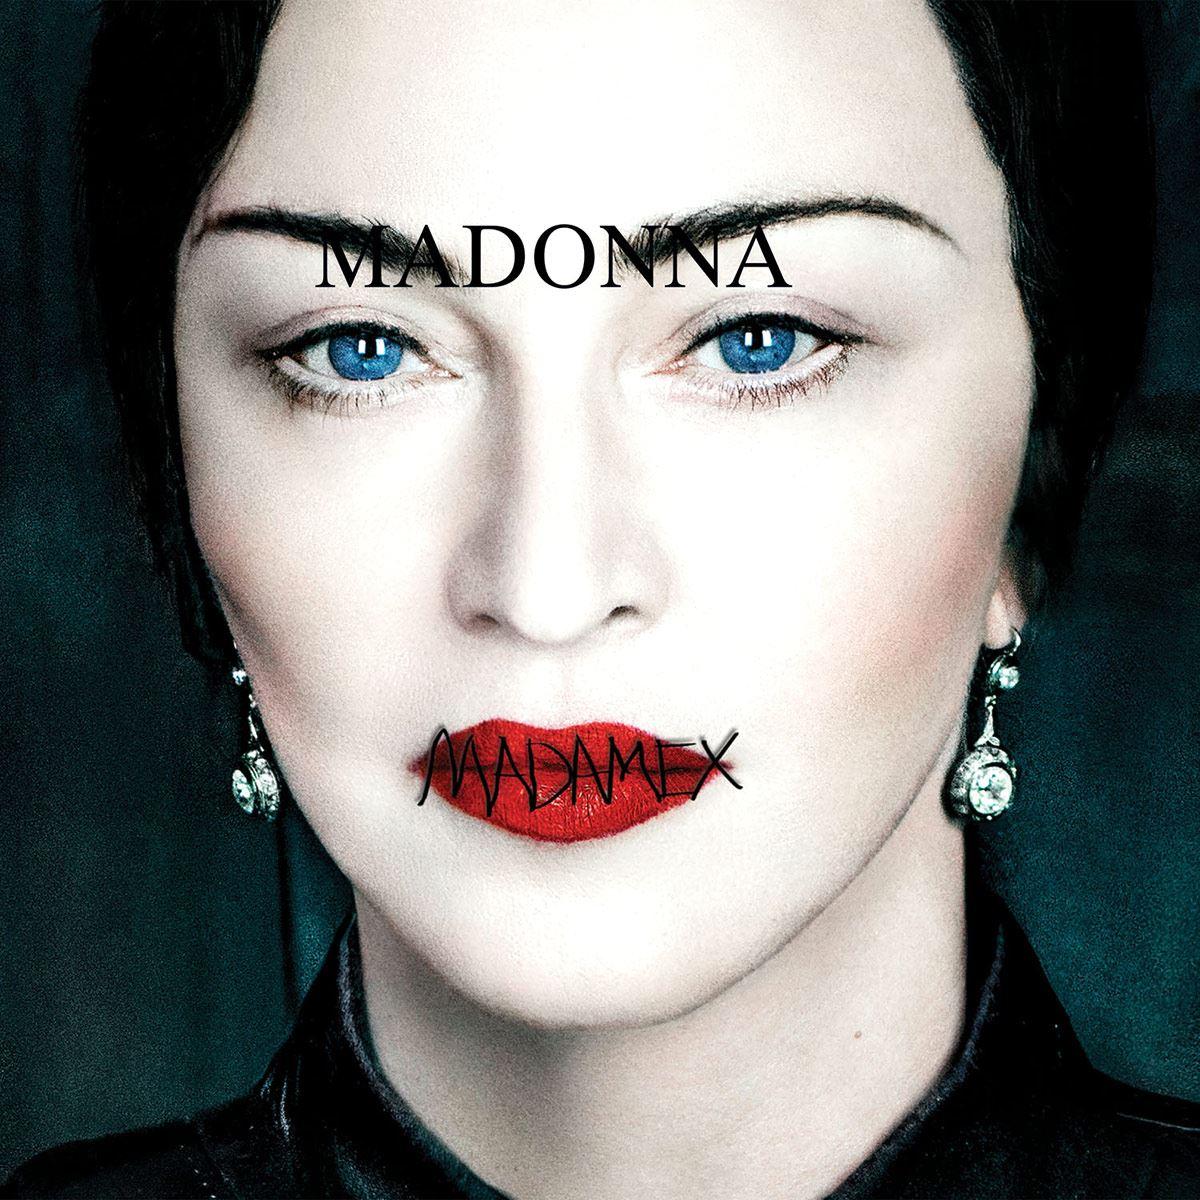 CD Madonna- Madame X